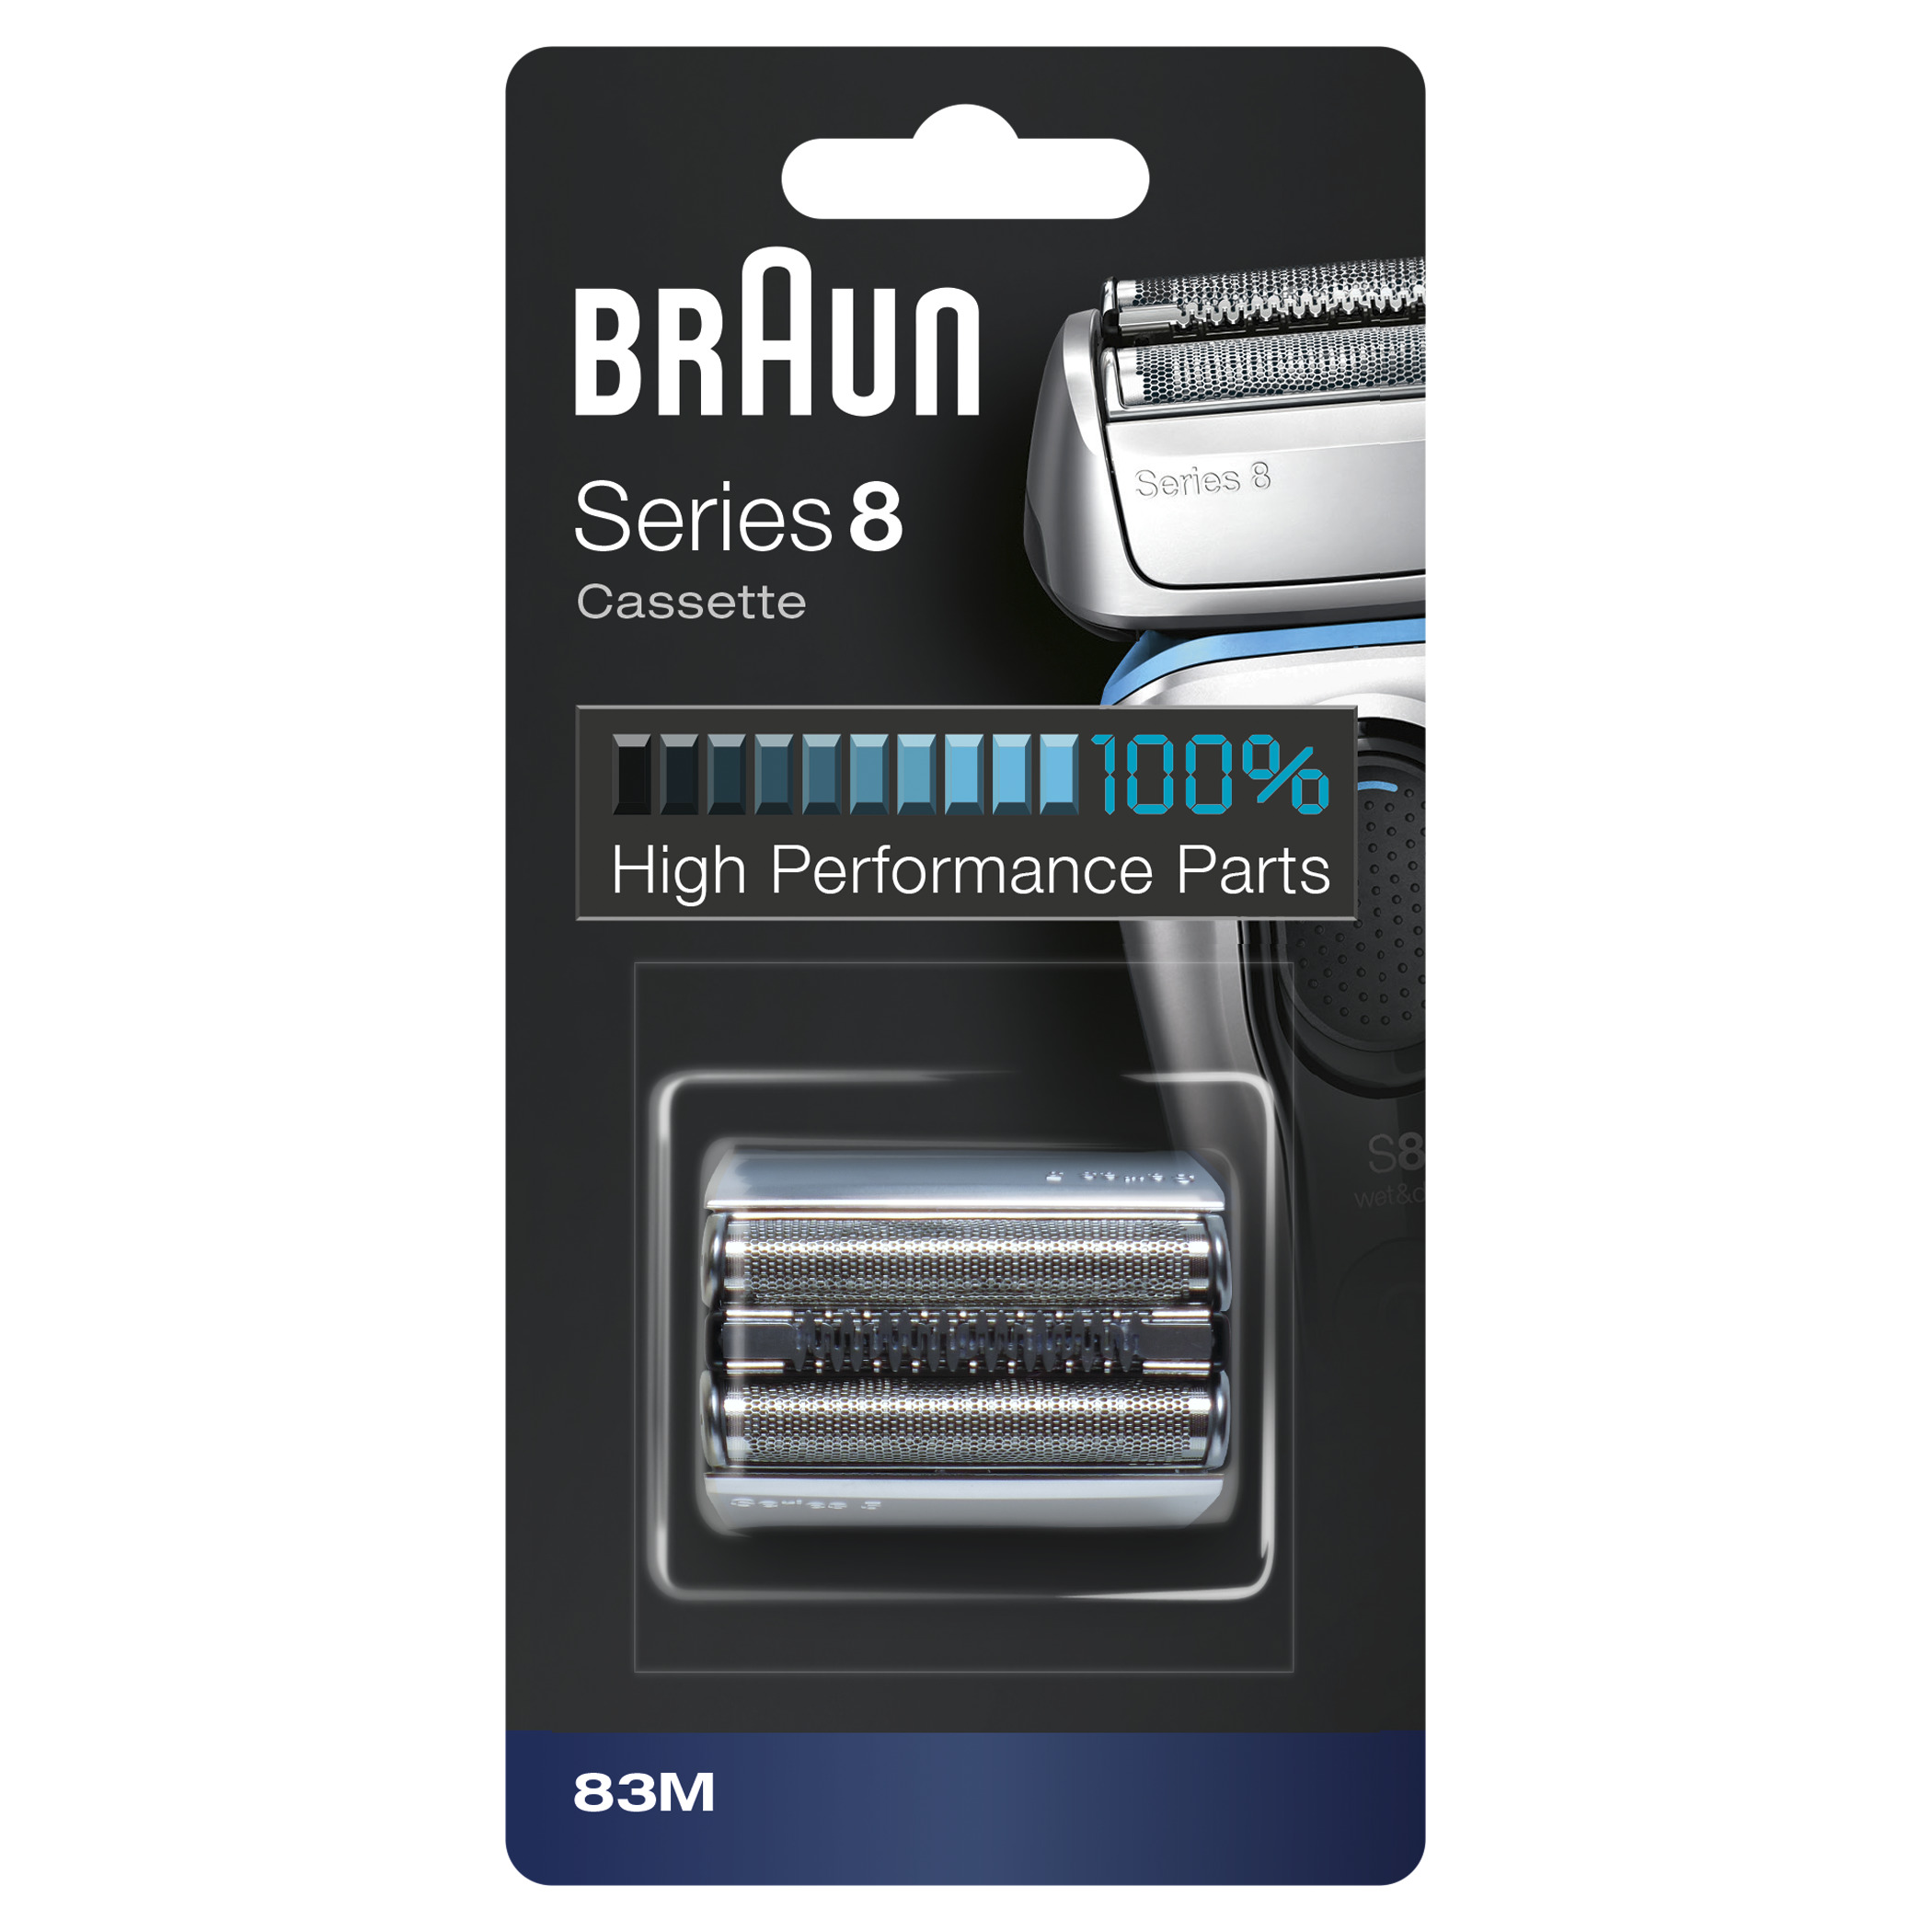 Сетка и режущий блок 83M для электробритв Braun Series 8